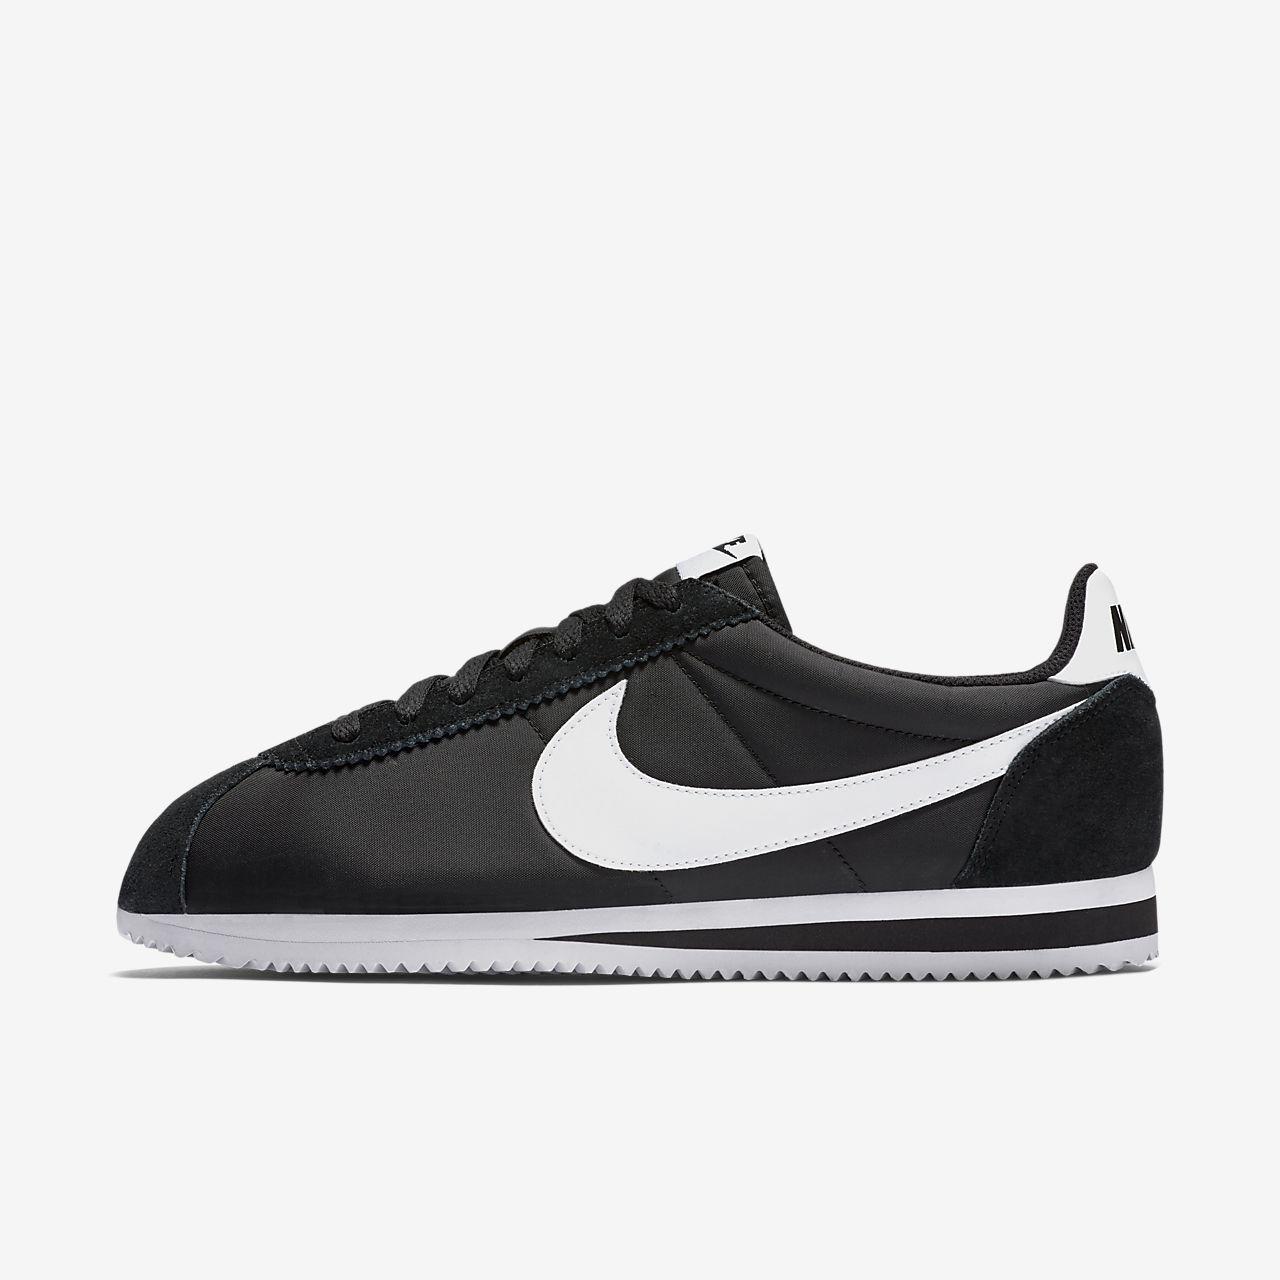 pretty nice 23547 1a1c4 Nike Classic Cortez Nylon Unisex Shoe